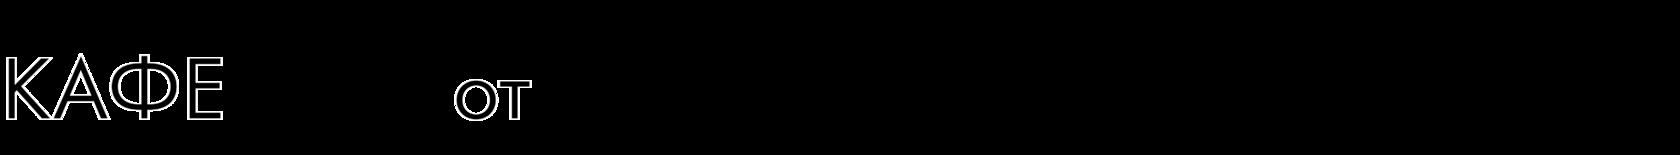 КАФЕ К5 от NORDIC COFFEE ROASTERS